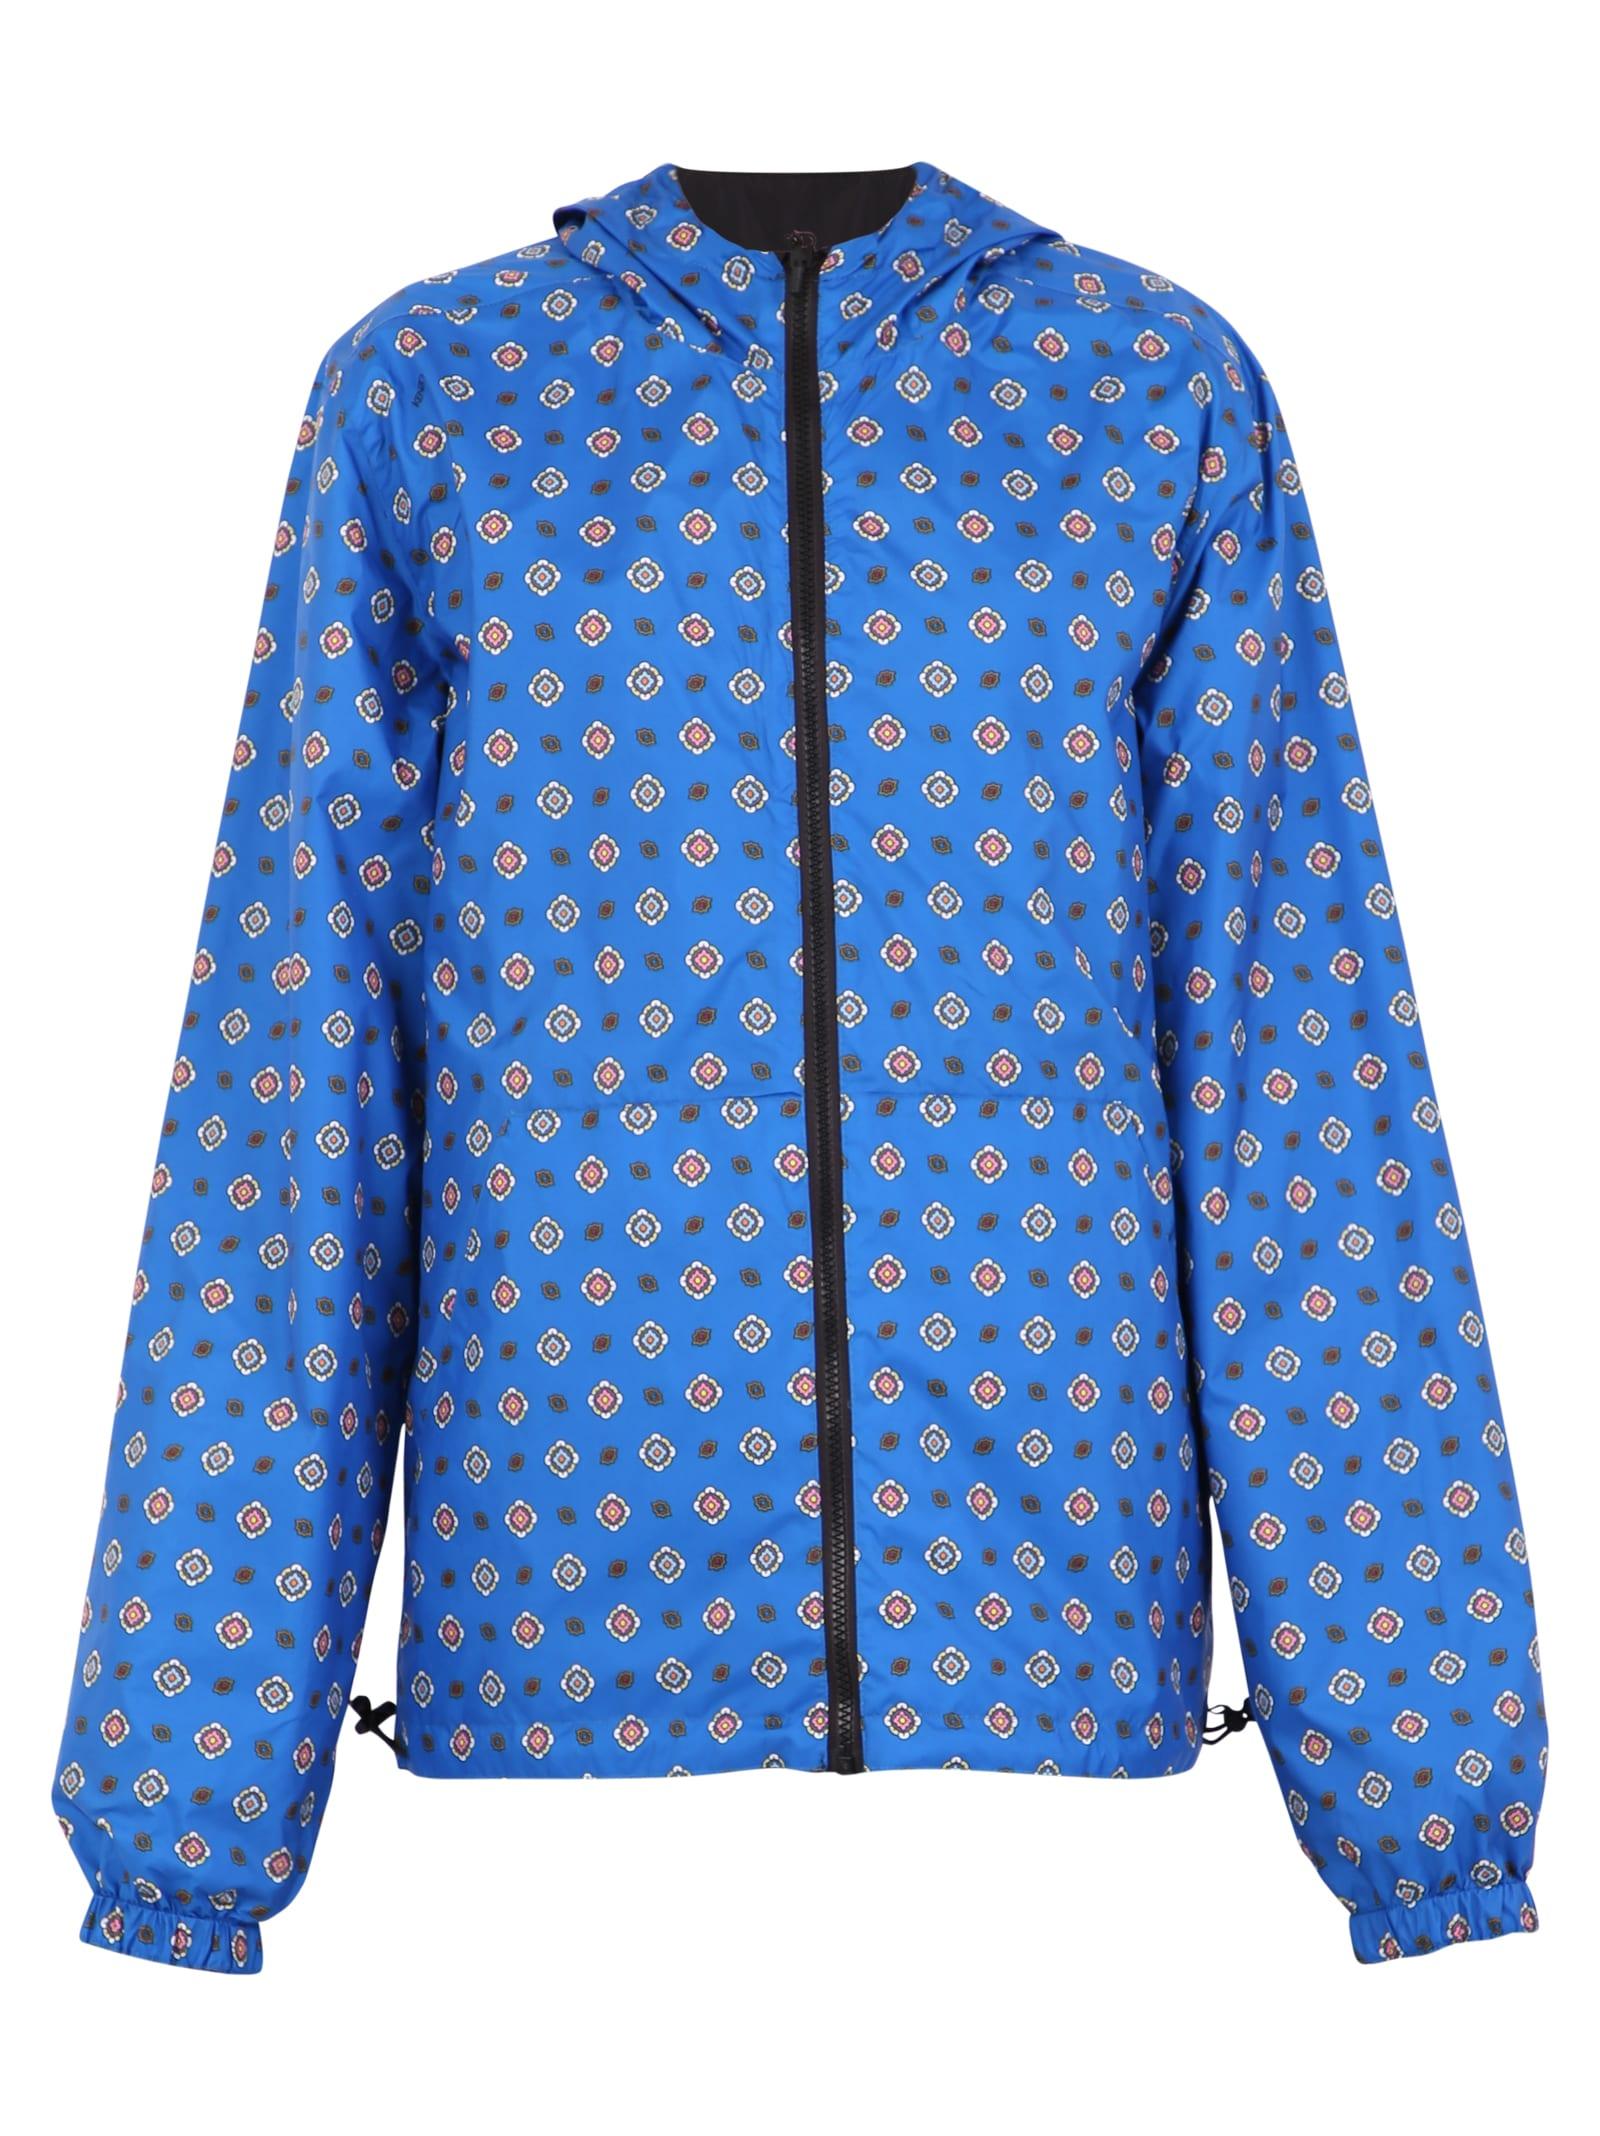 d30f6362 Kenzo Reversible Nylon Jacket